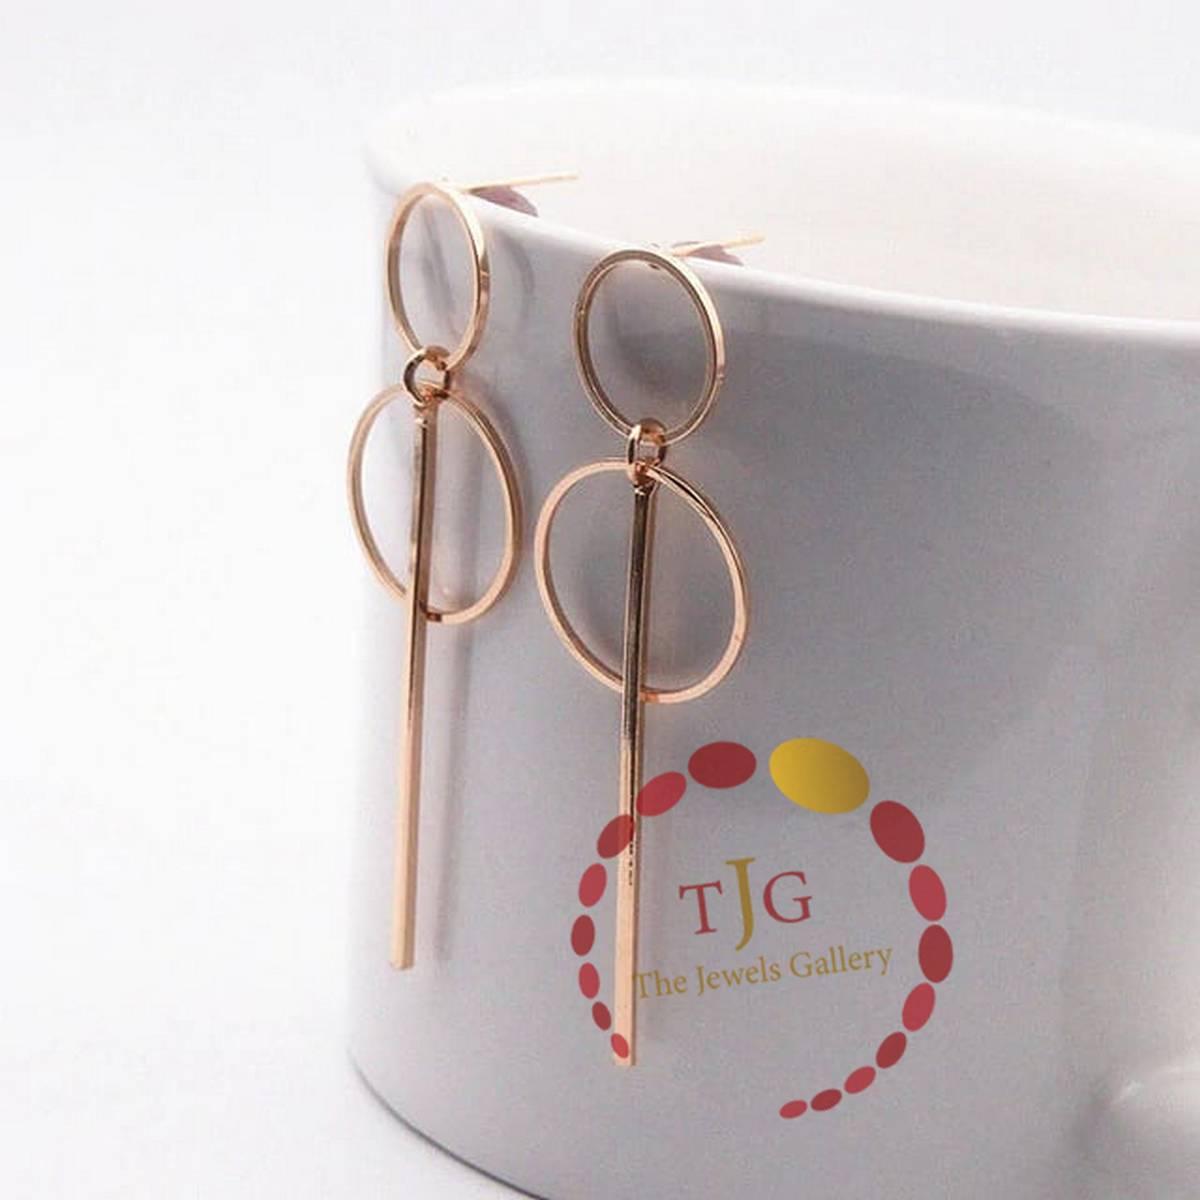 Korean Style Acrylic Drop Earrings - Stylish earrings for girls - Beautiful Earings for Girls - Trendy Earings 2021 - Long Imported Fashion Jewellery